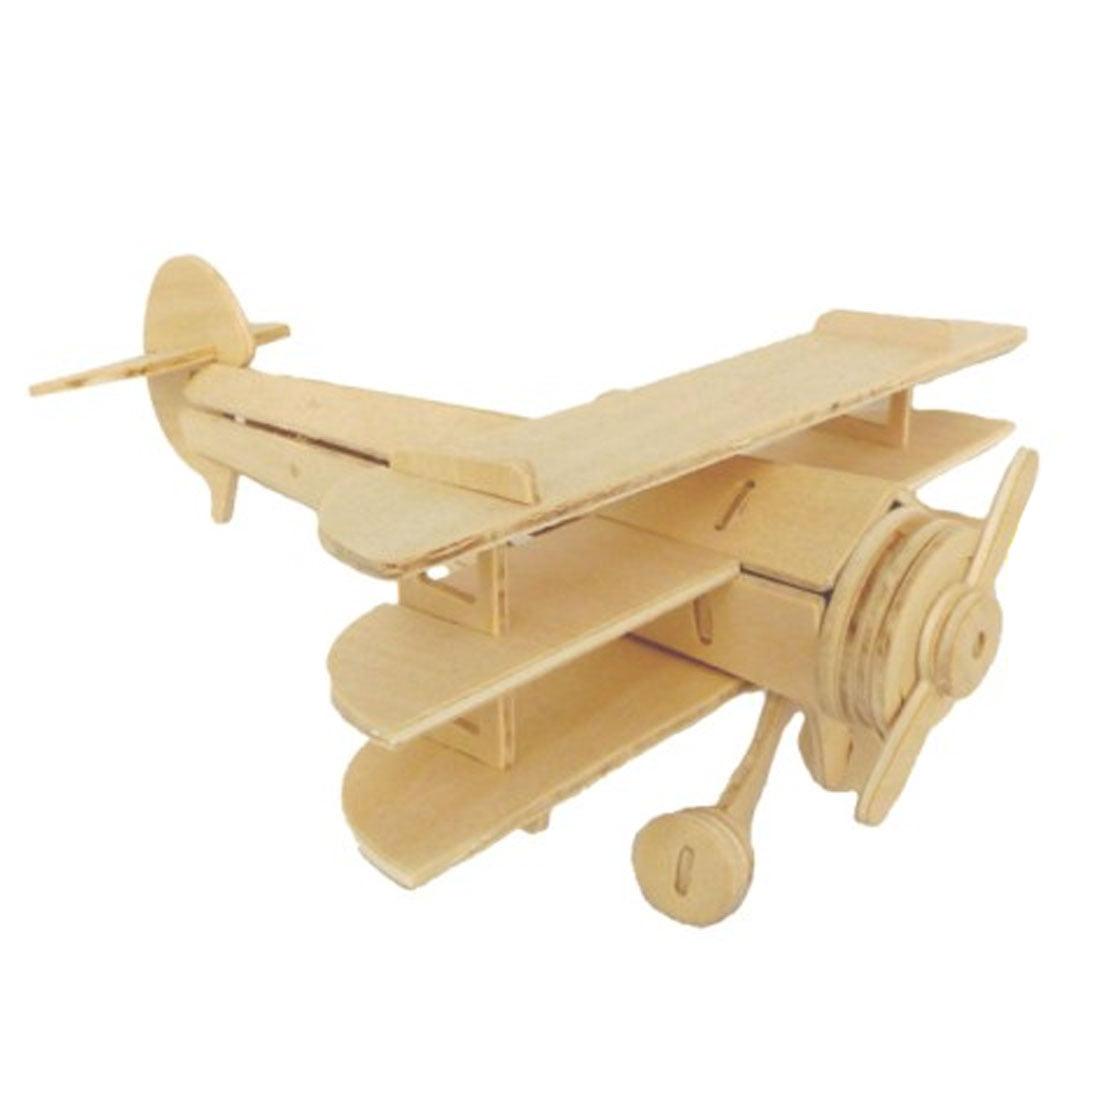 Wooden Assemble 3D Sopwith Triplane Model Construction Kit Puzzle Toy